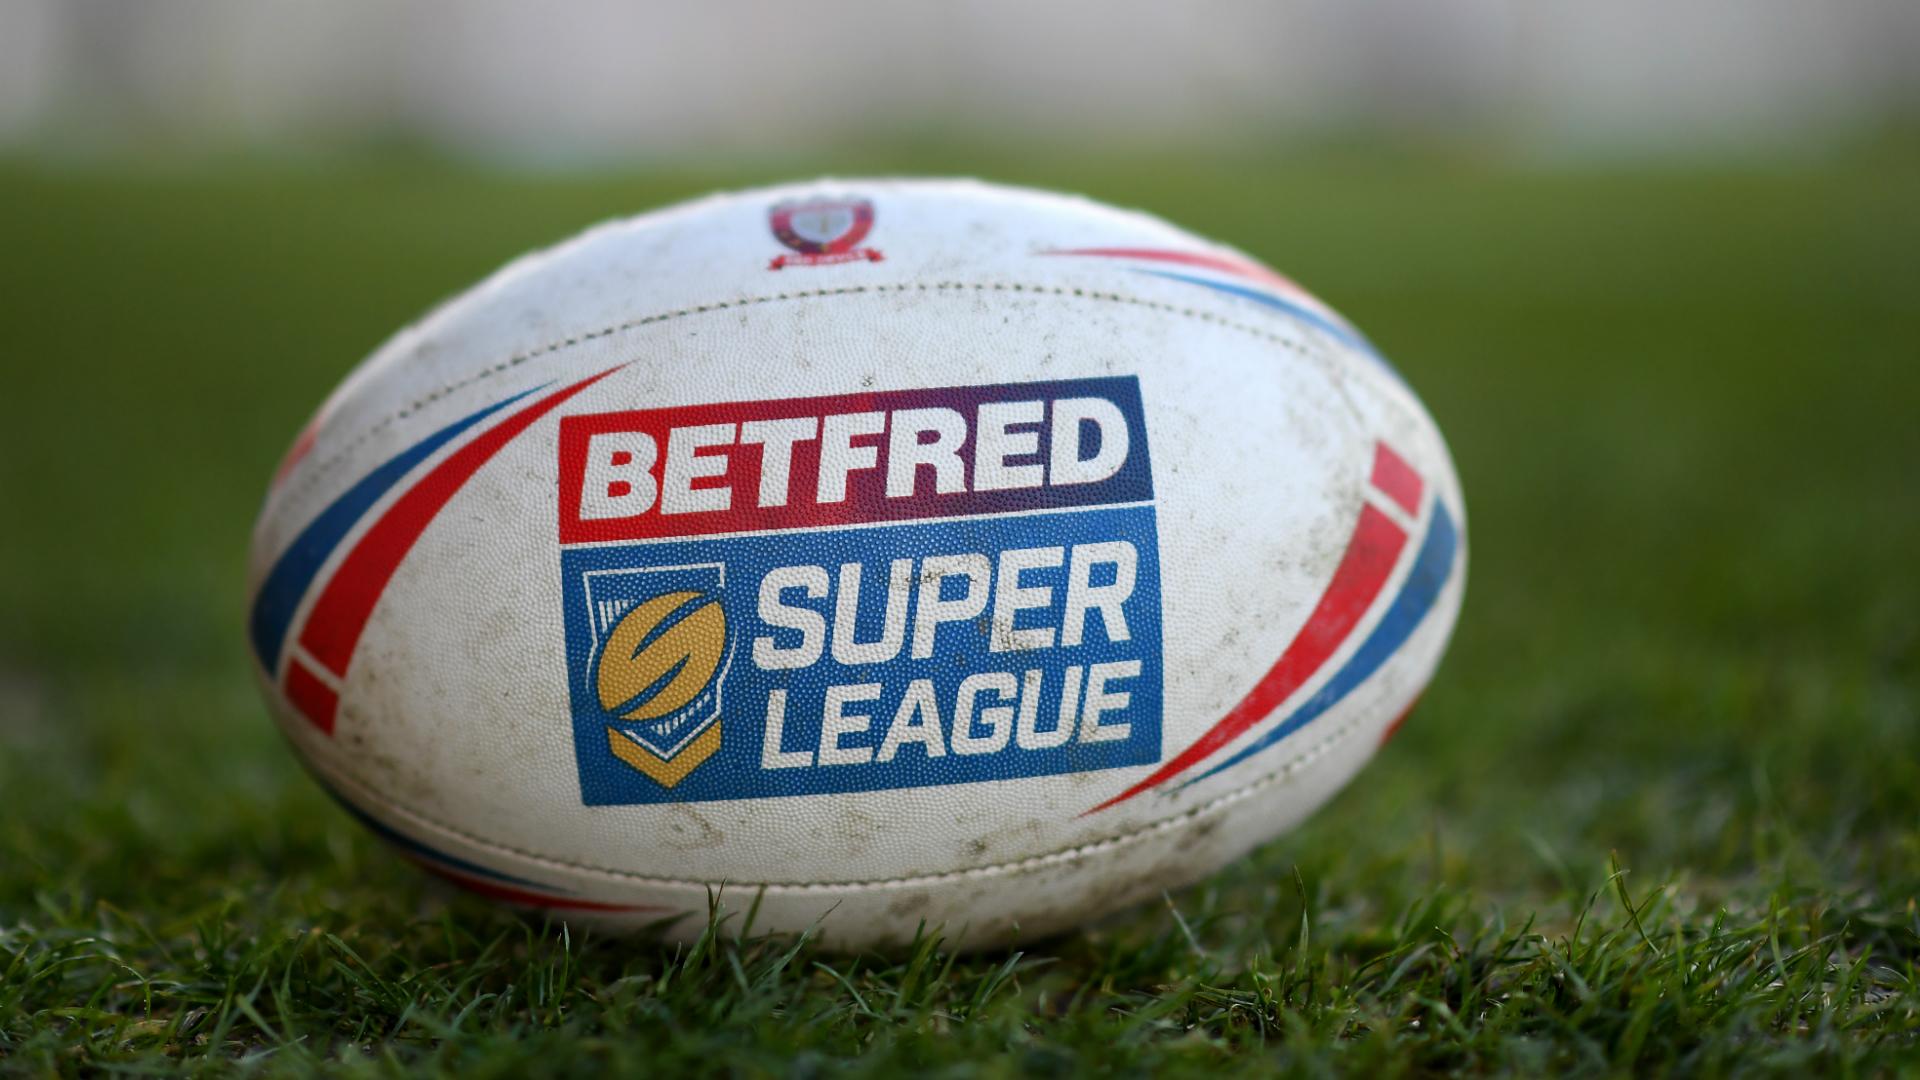 Wakefield Trinity vs Leeds Rhinos postponed after positive coronavirus tests